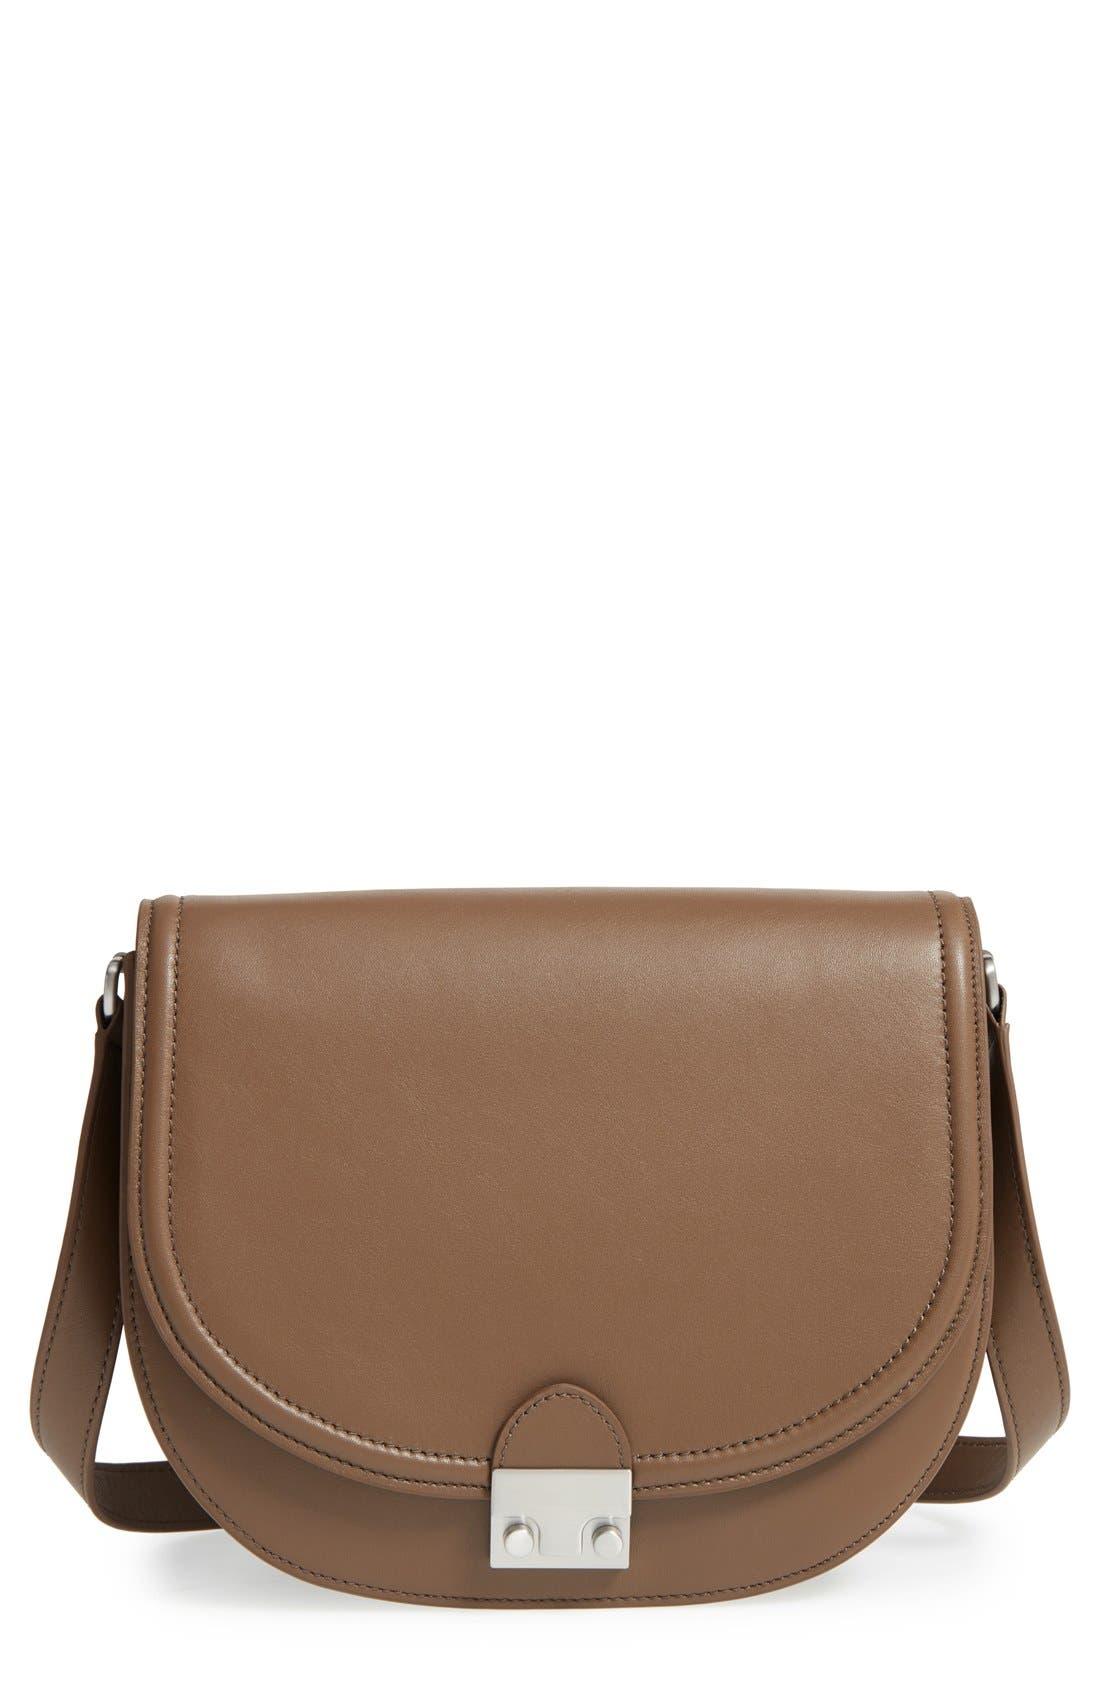 Alternate Image 1 Selected - Loeffler Randall 'Large' Leather Saddle Bag